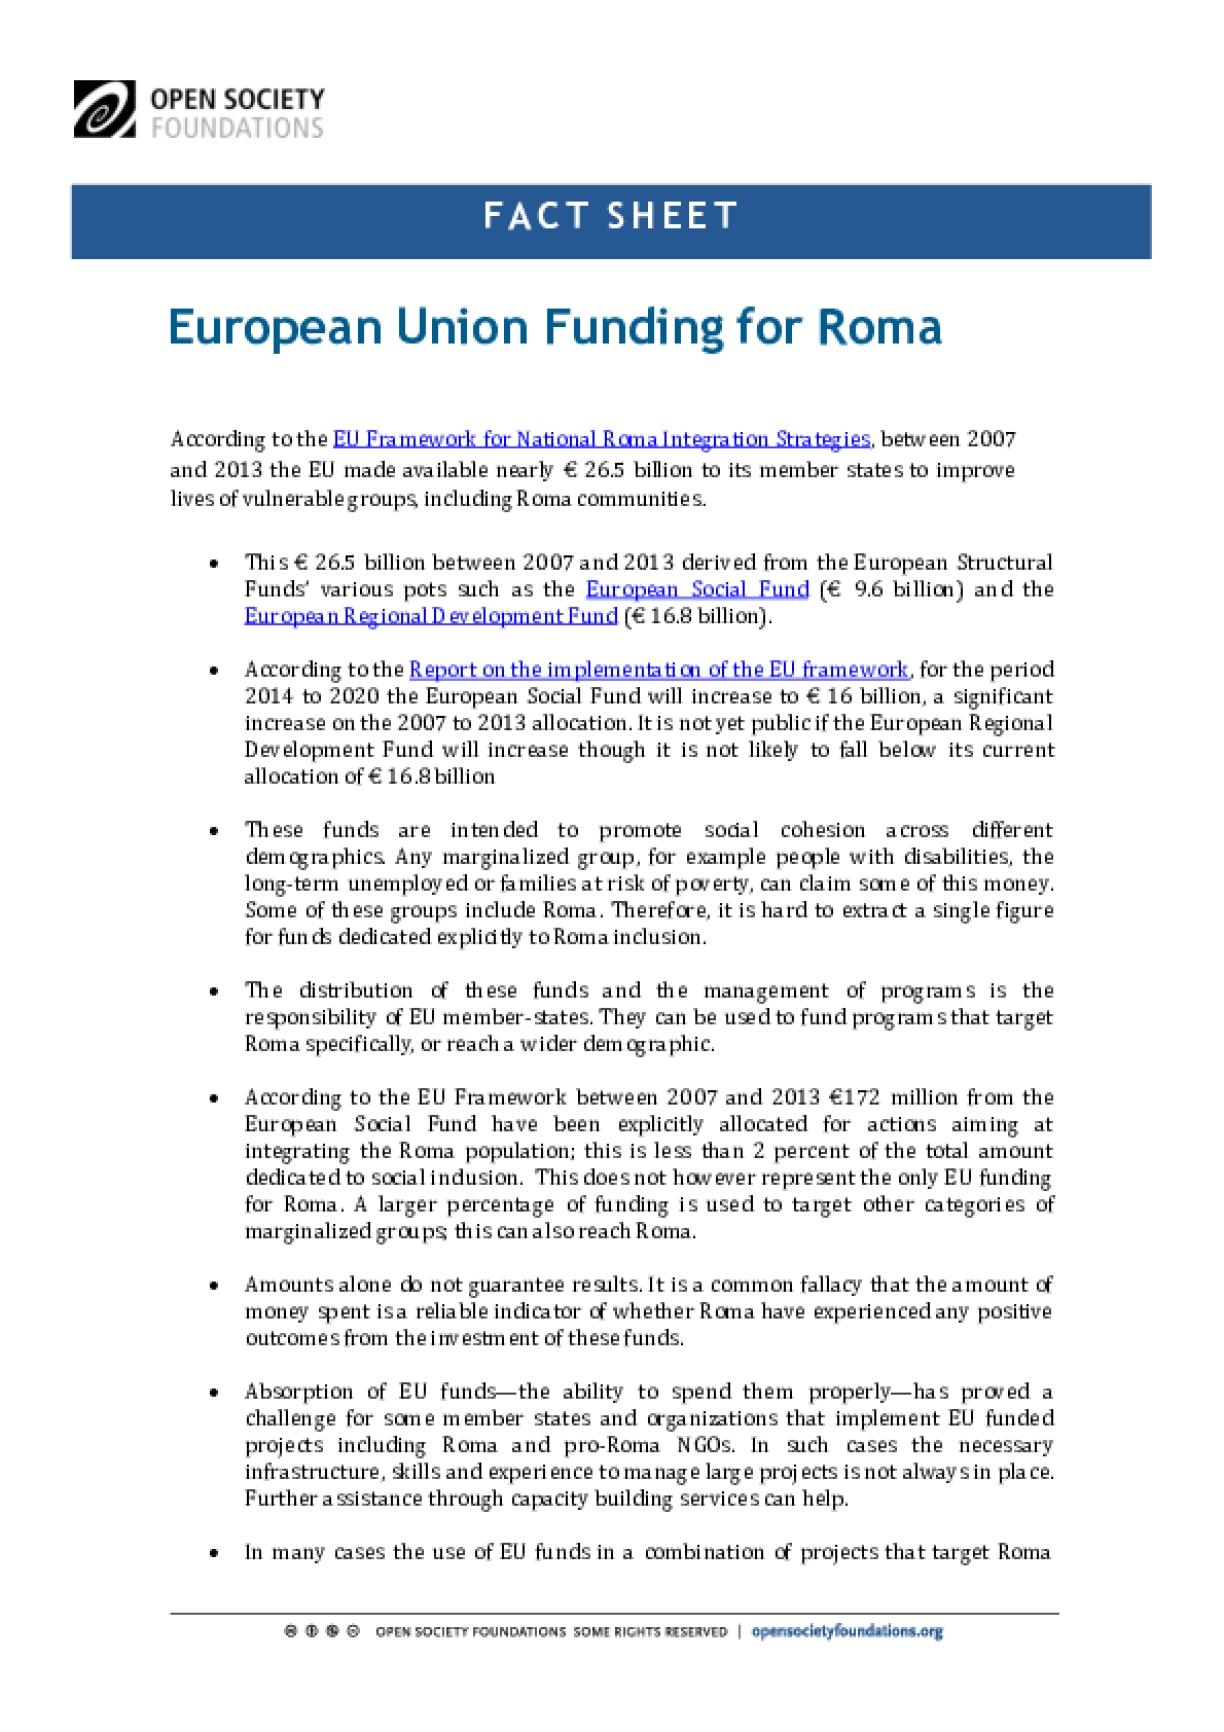 European Union Funding for Roma